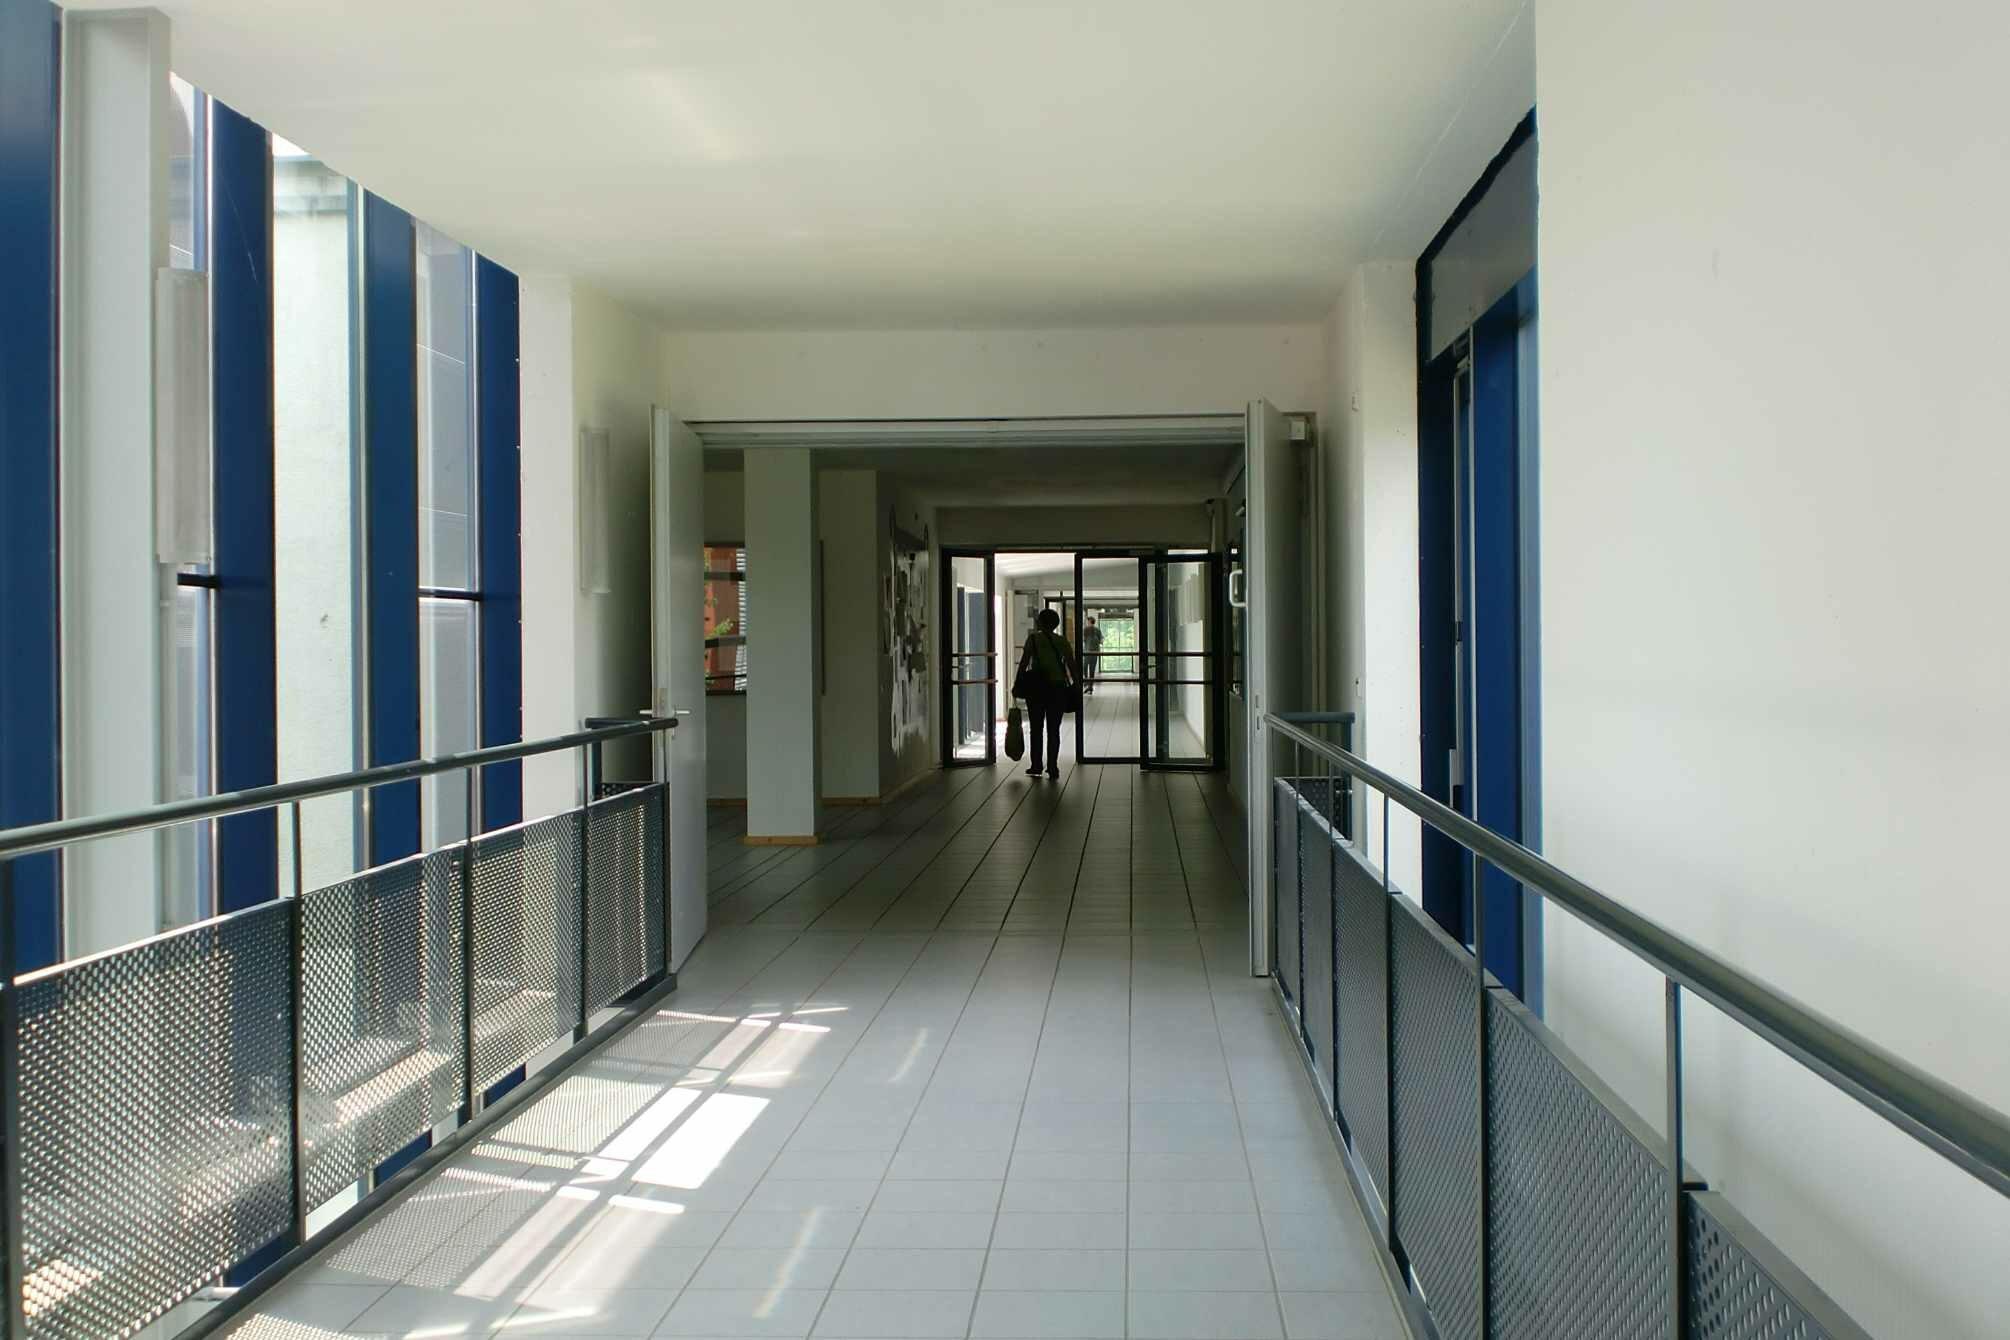 Flying Days am Umwelt-Campus Birkenfeld